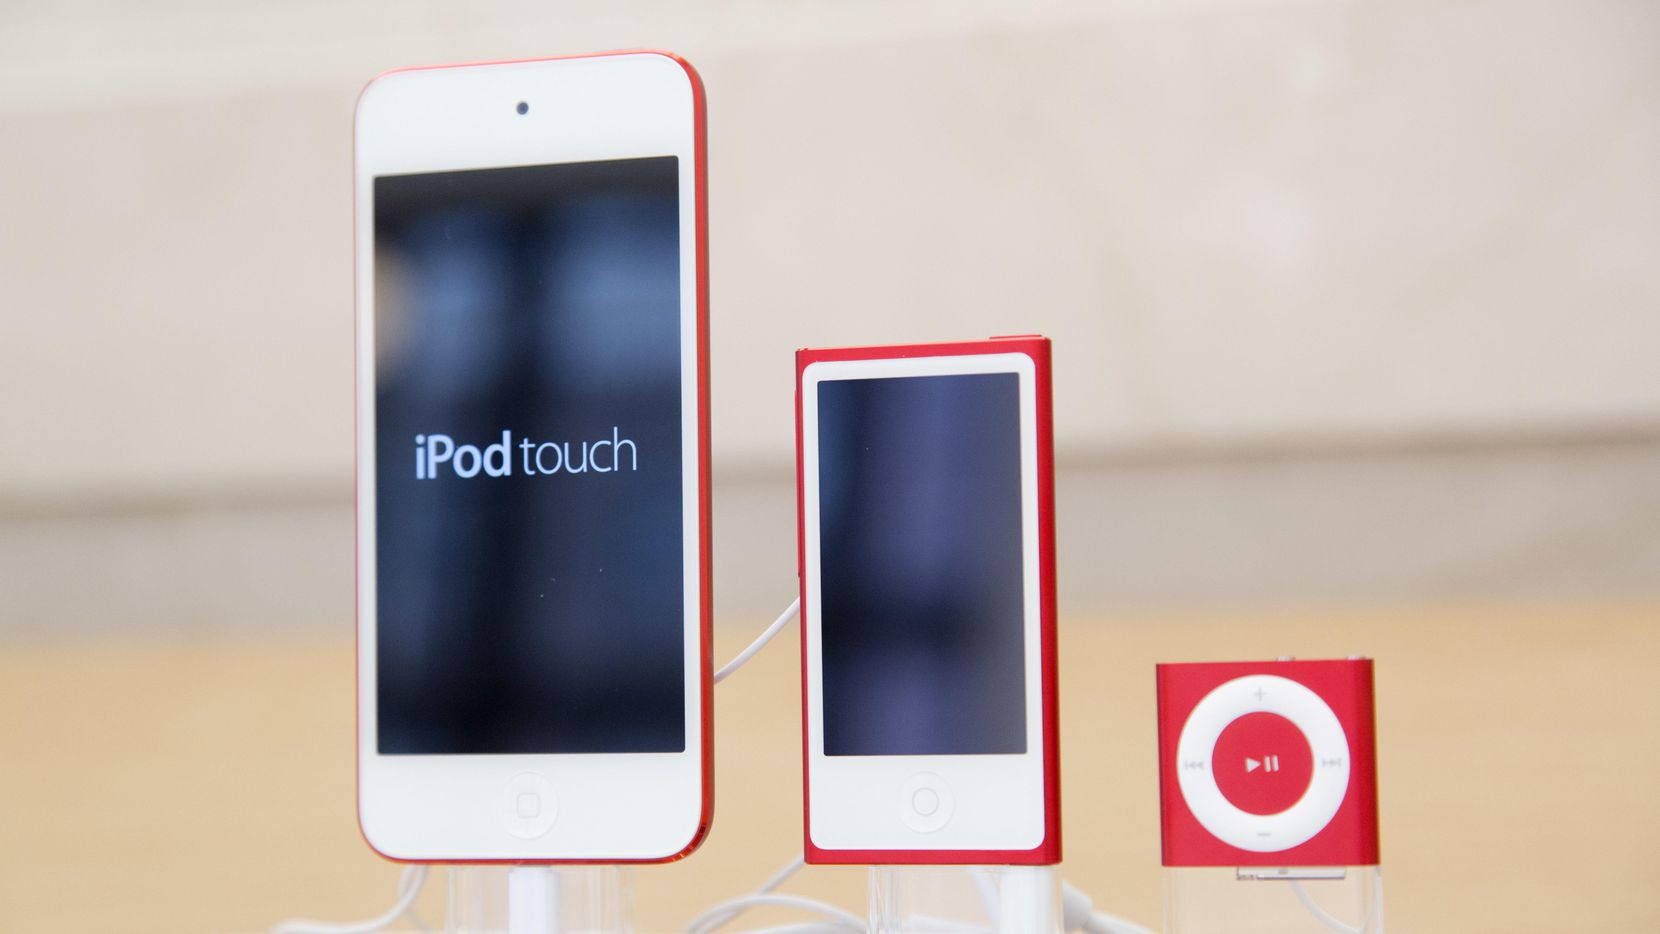 Los aparatos iPod Touch, iPod Nano y iPod Shuffle de Apple.(AP)